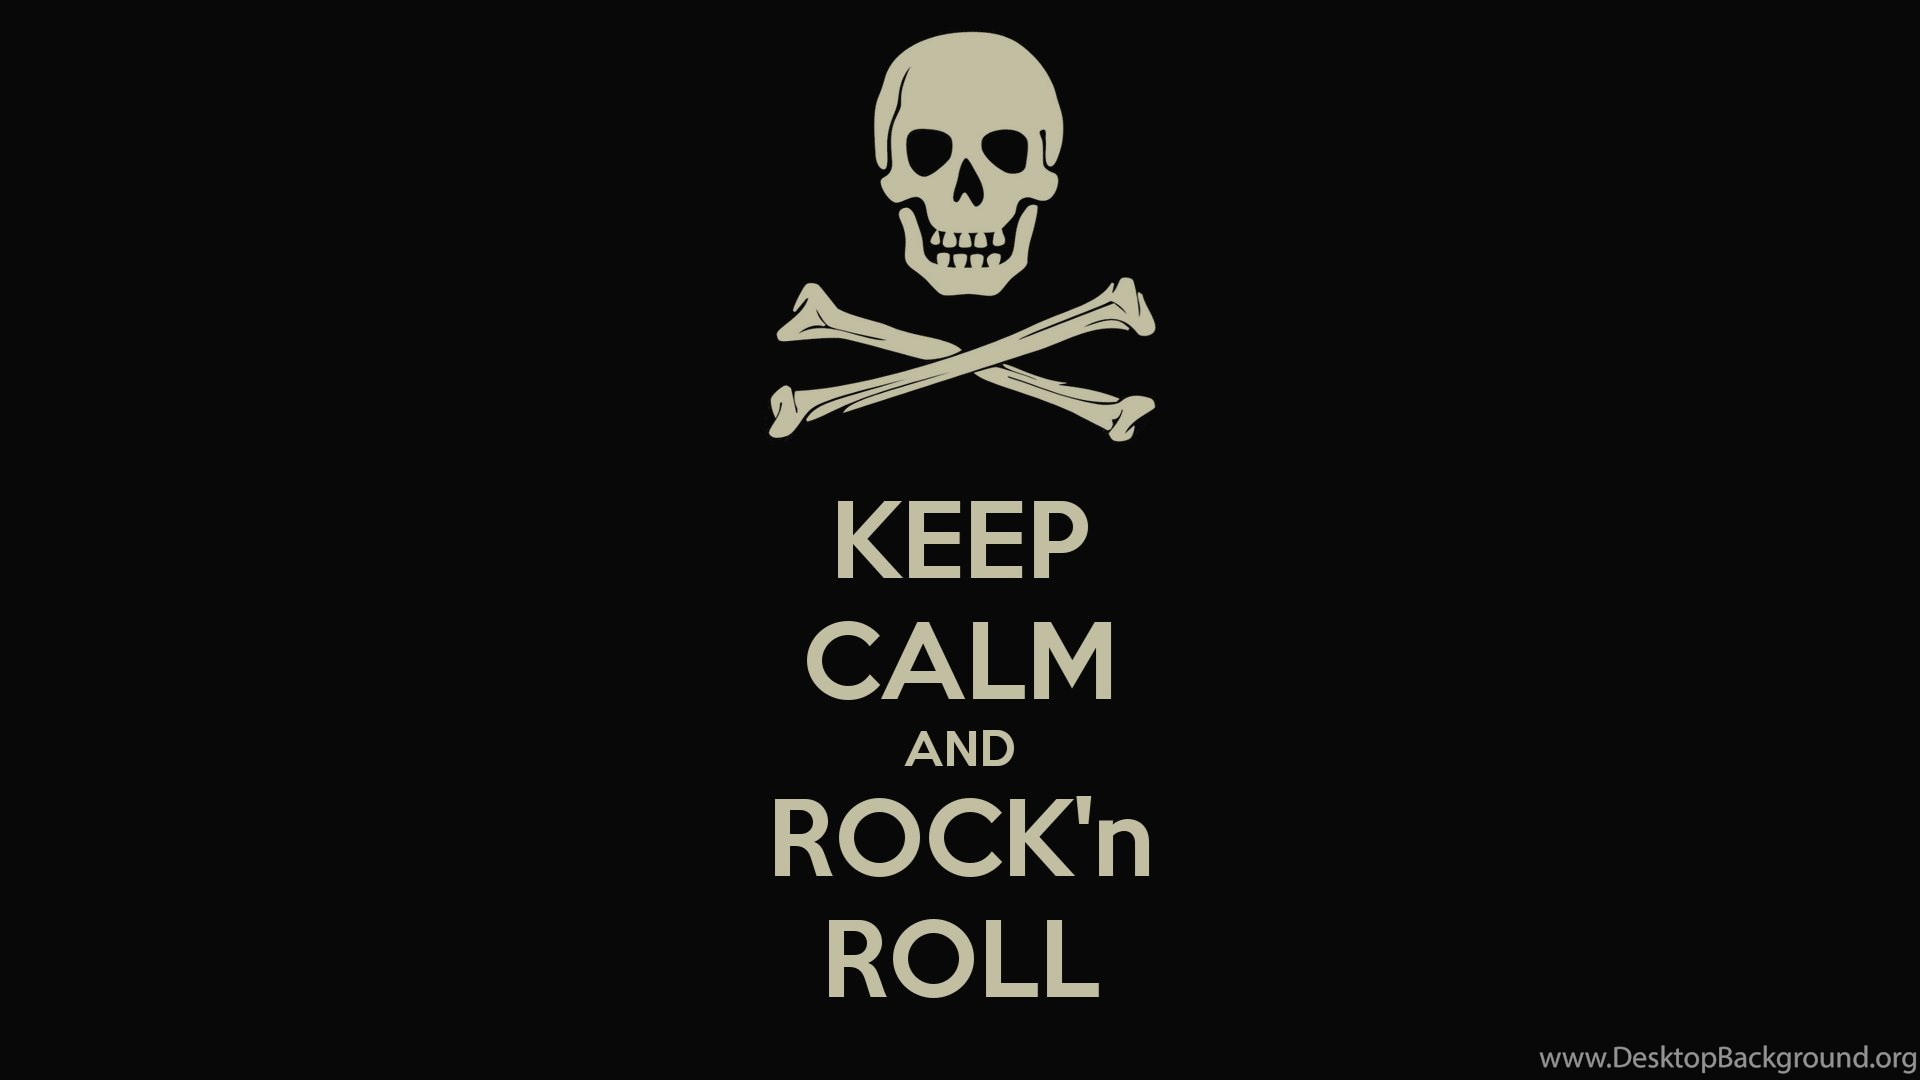 Wallpapers Rock N Roll Keep Calm And 979968 1920x1080 Desktop